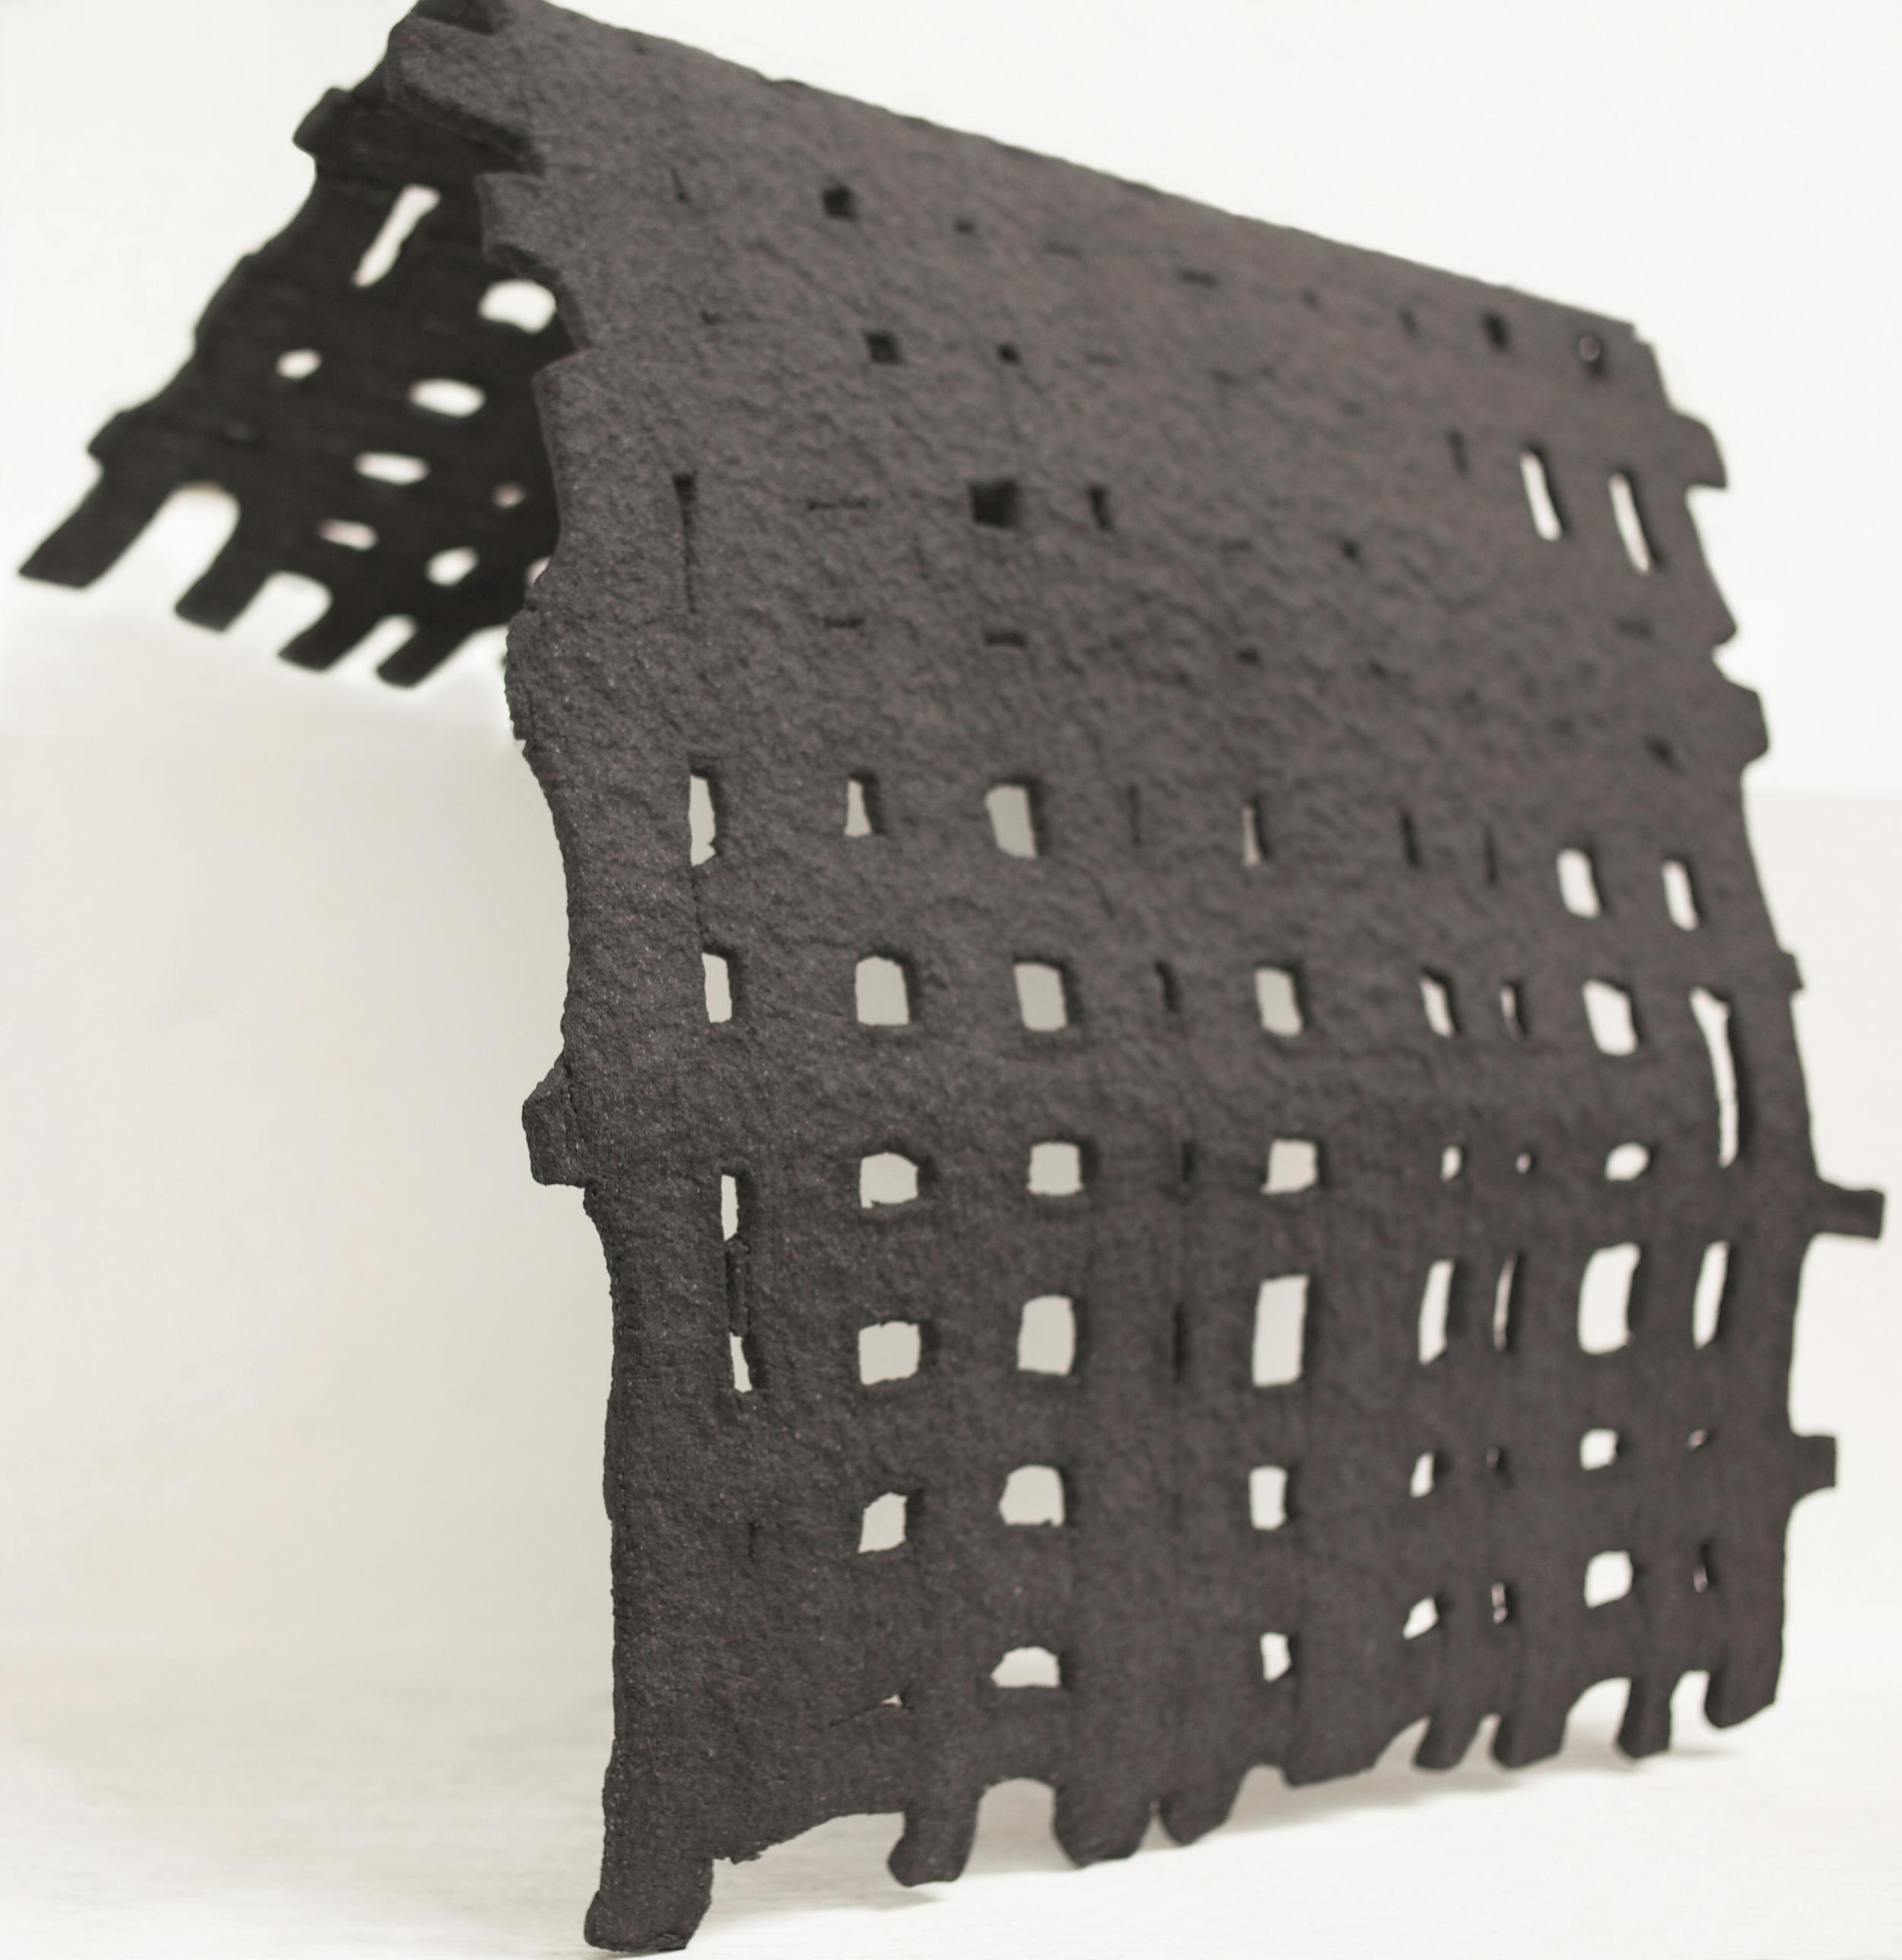 salt grid1  2014 salt, flour, graphite 18 x 16.5 x 10 inches